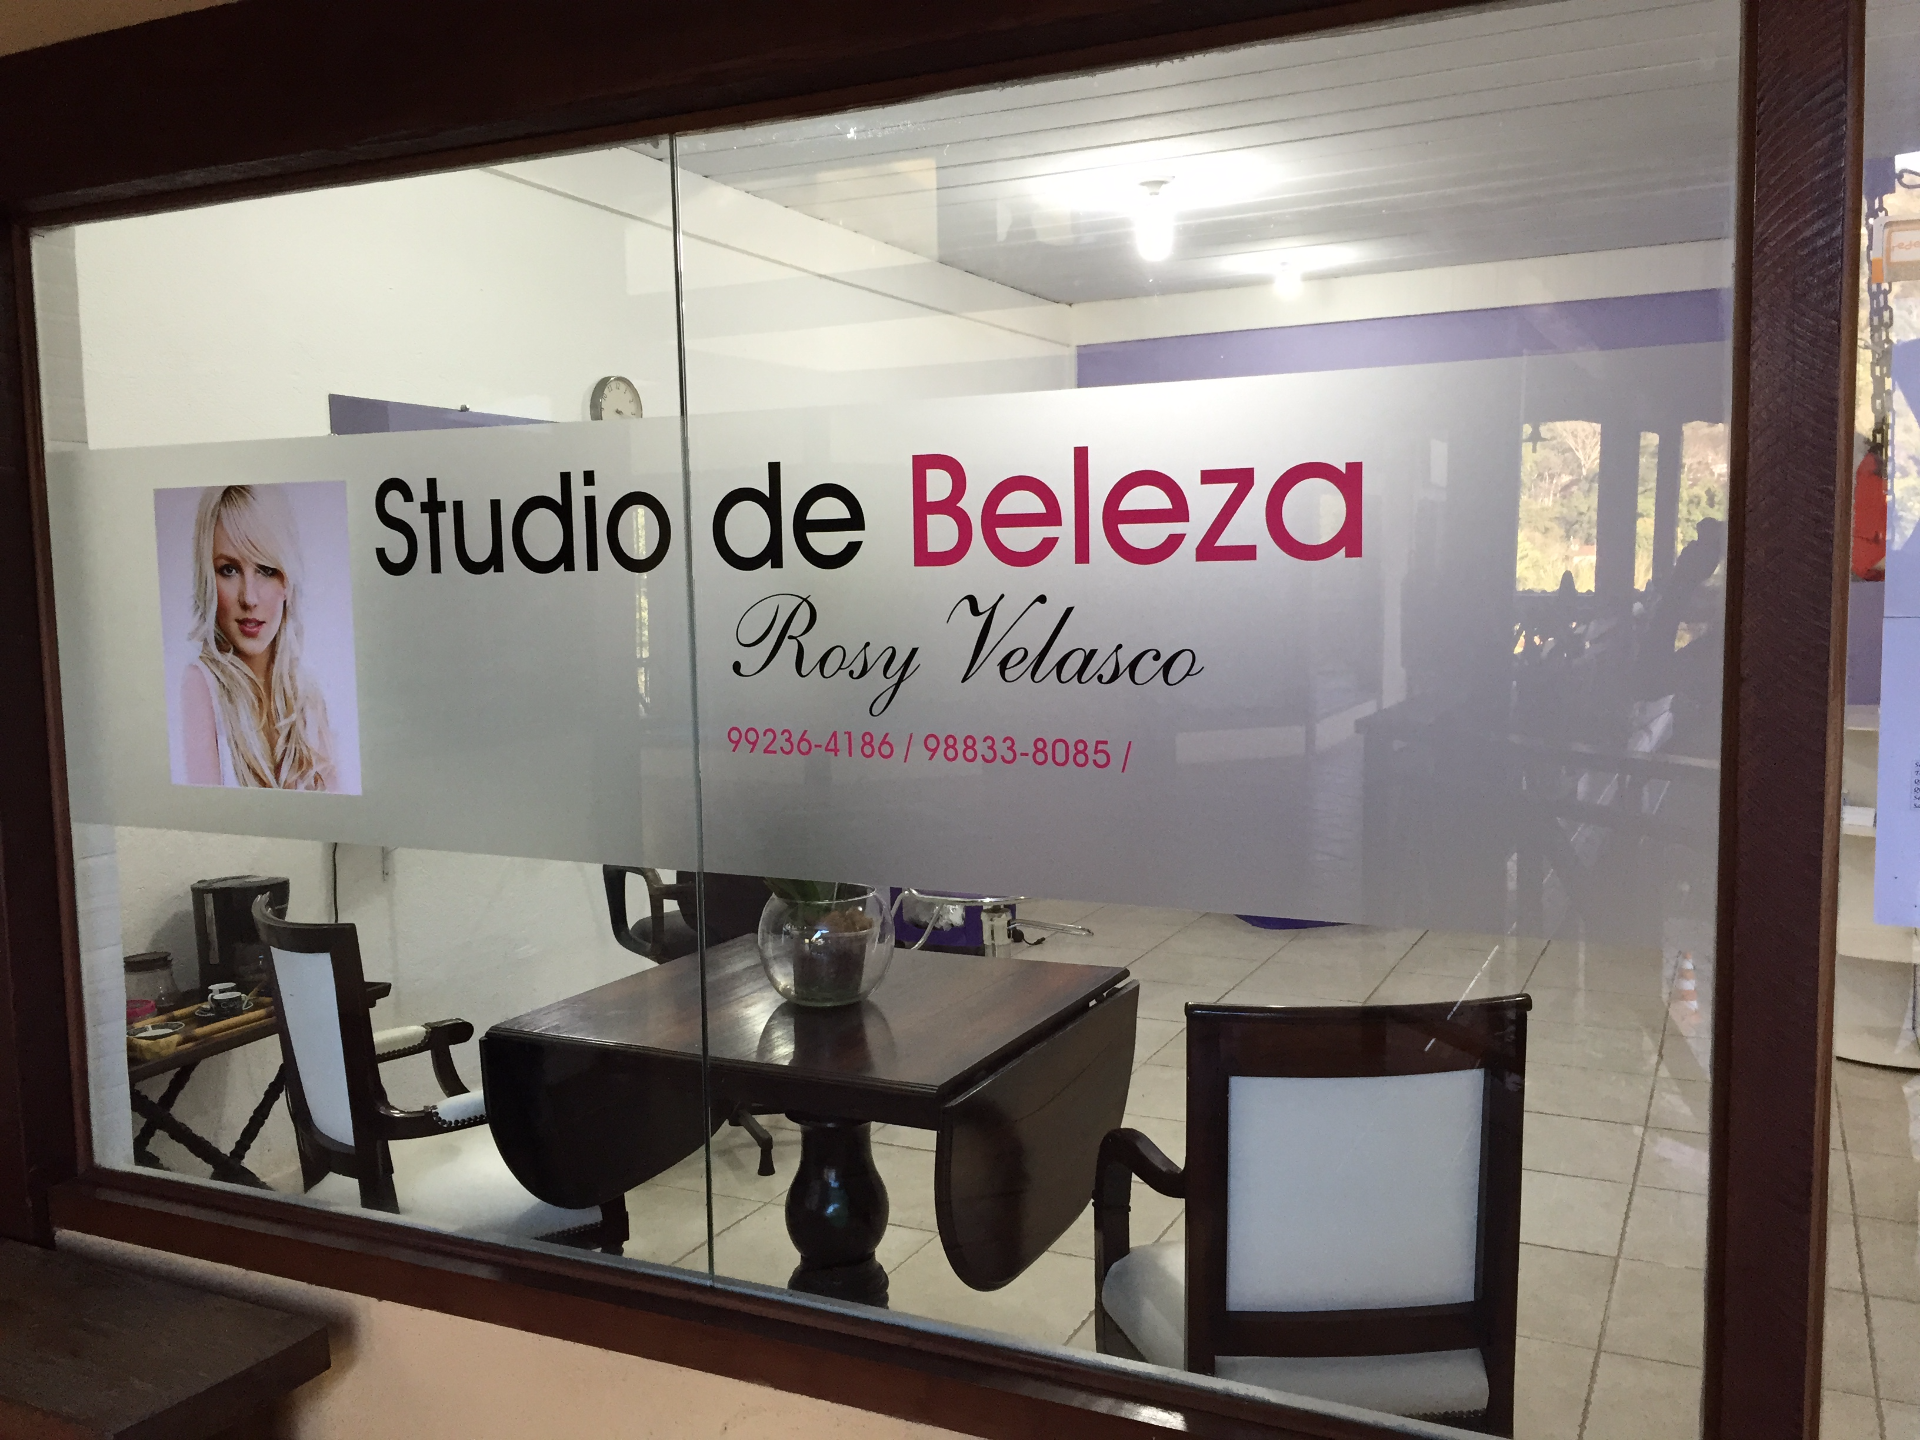 51216 Studio de Beleza Rosy Velasco (2)_edited.JPG